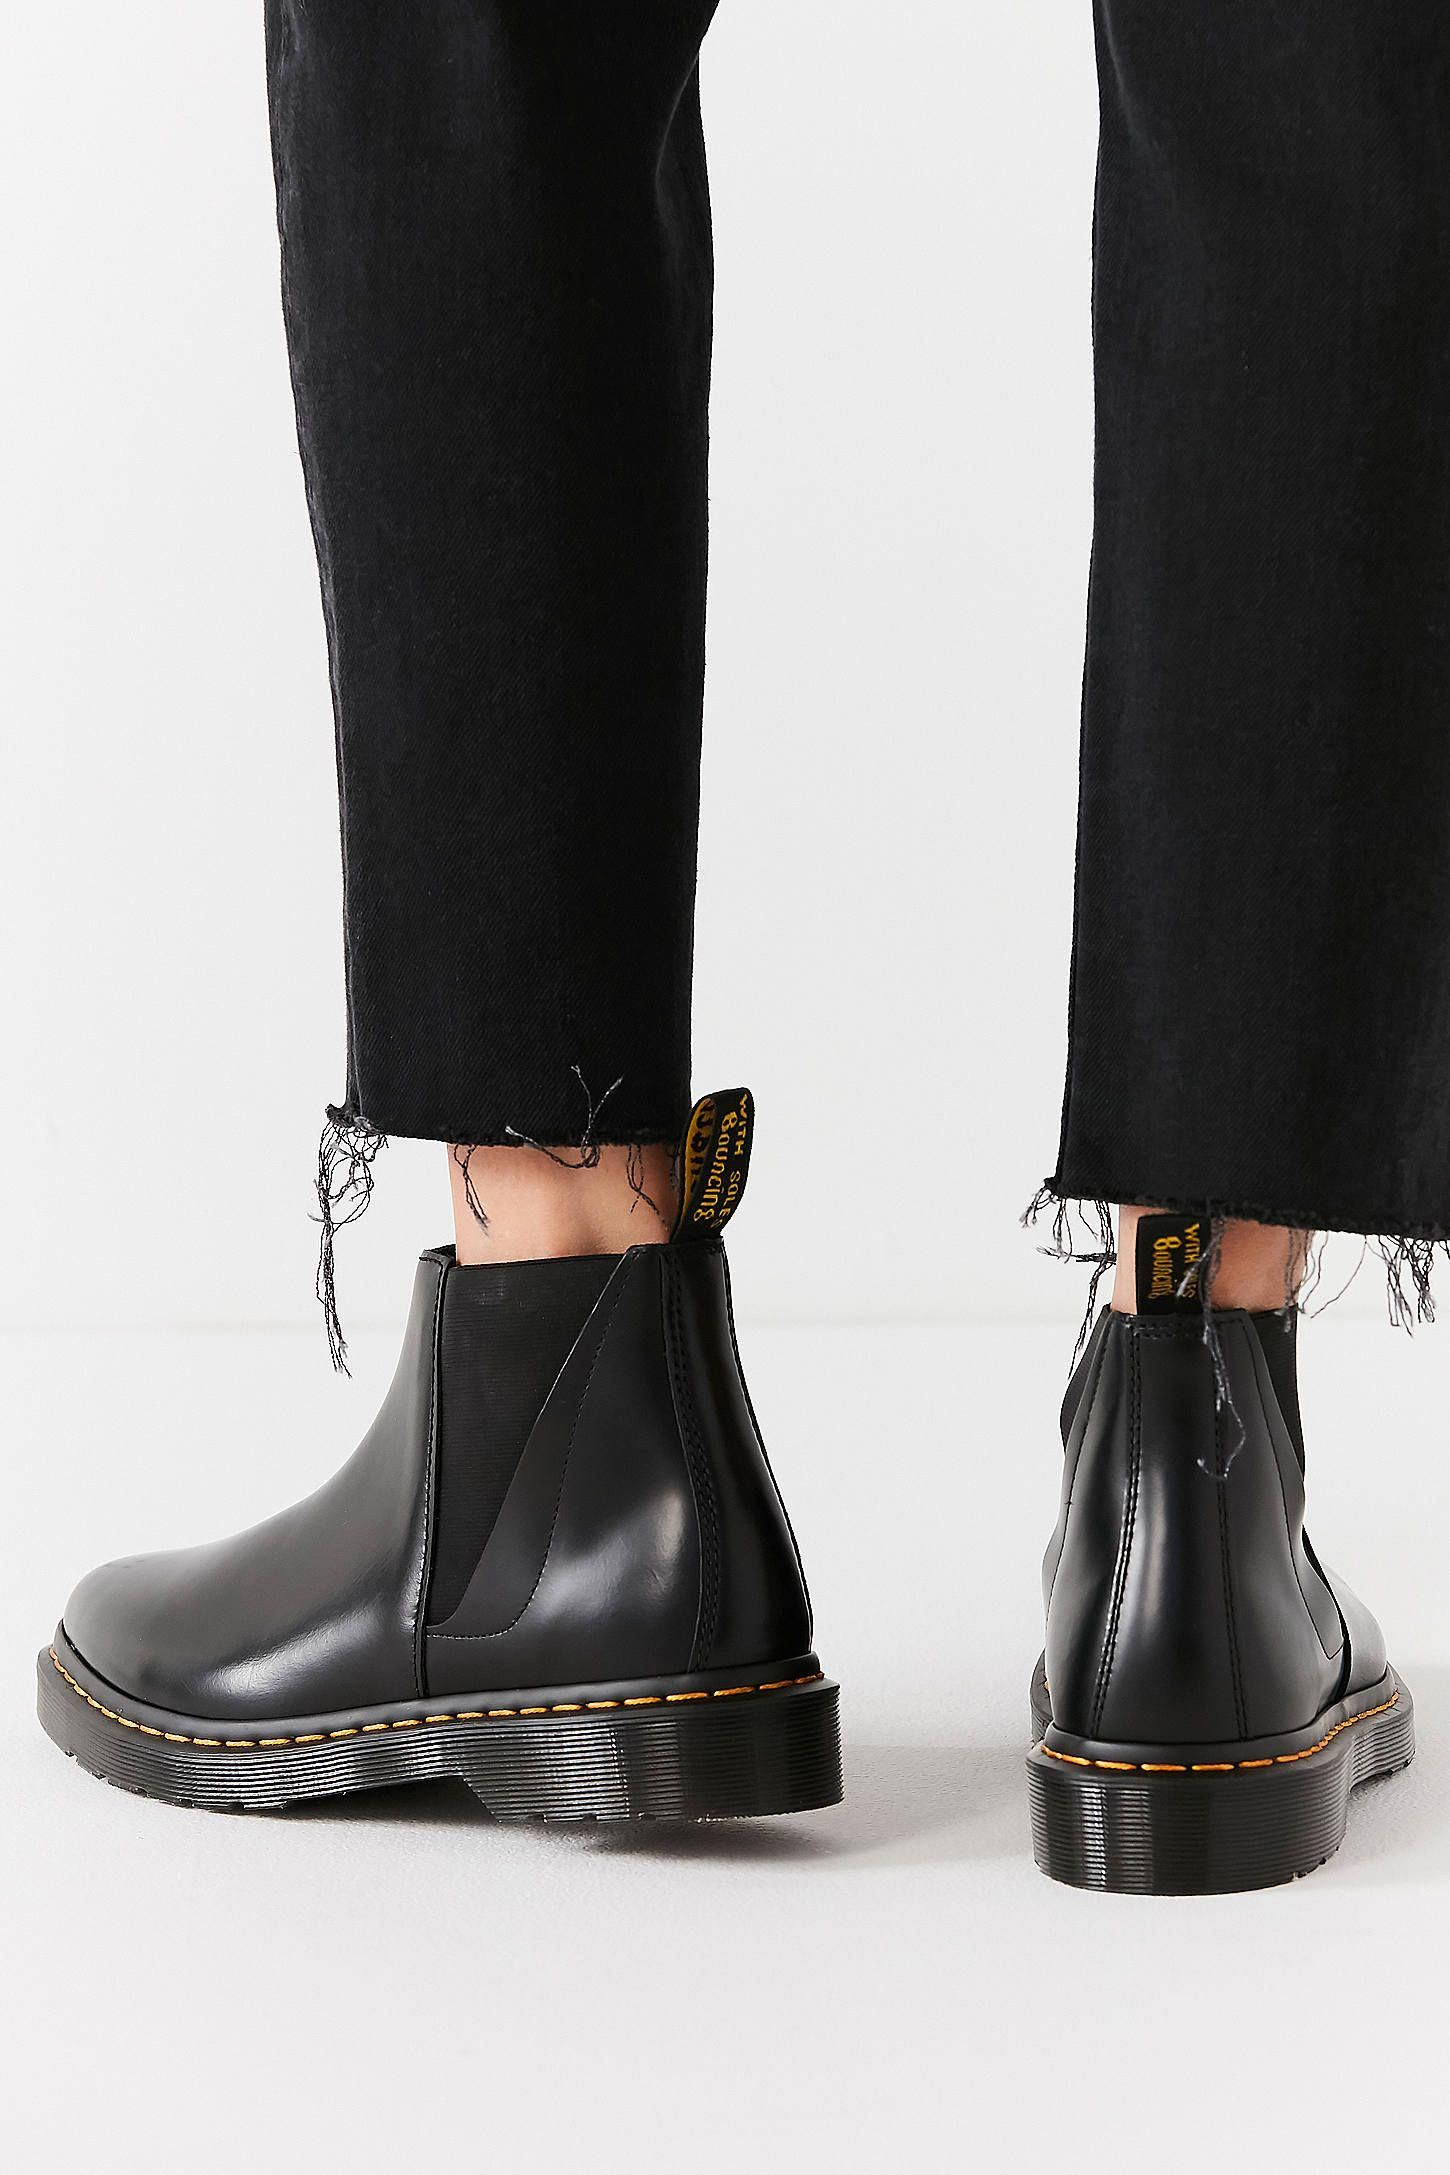 Dr. Martens Bianca Chelsea Boot | Urban